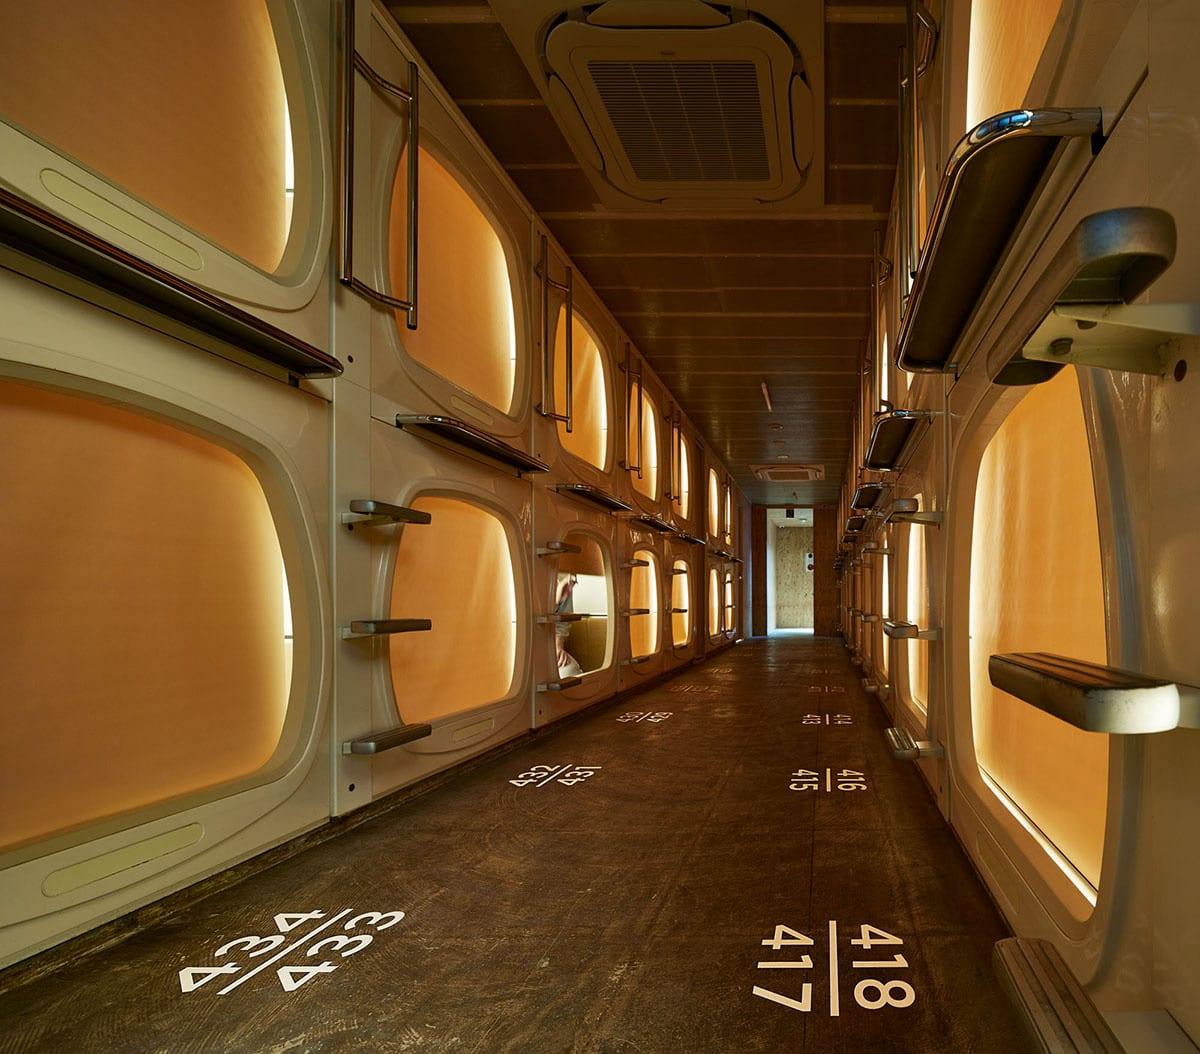 Do-C Ebisu Tokyo Capsule Hotel Renovation by Schemata Architects | Yellowtrace